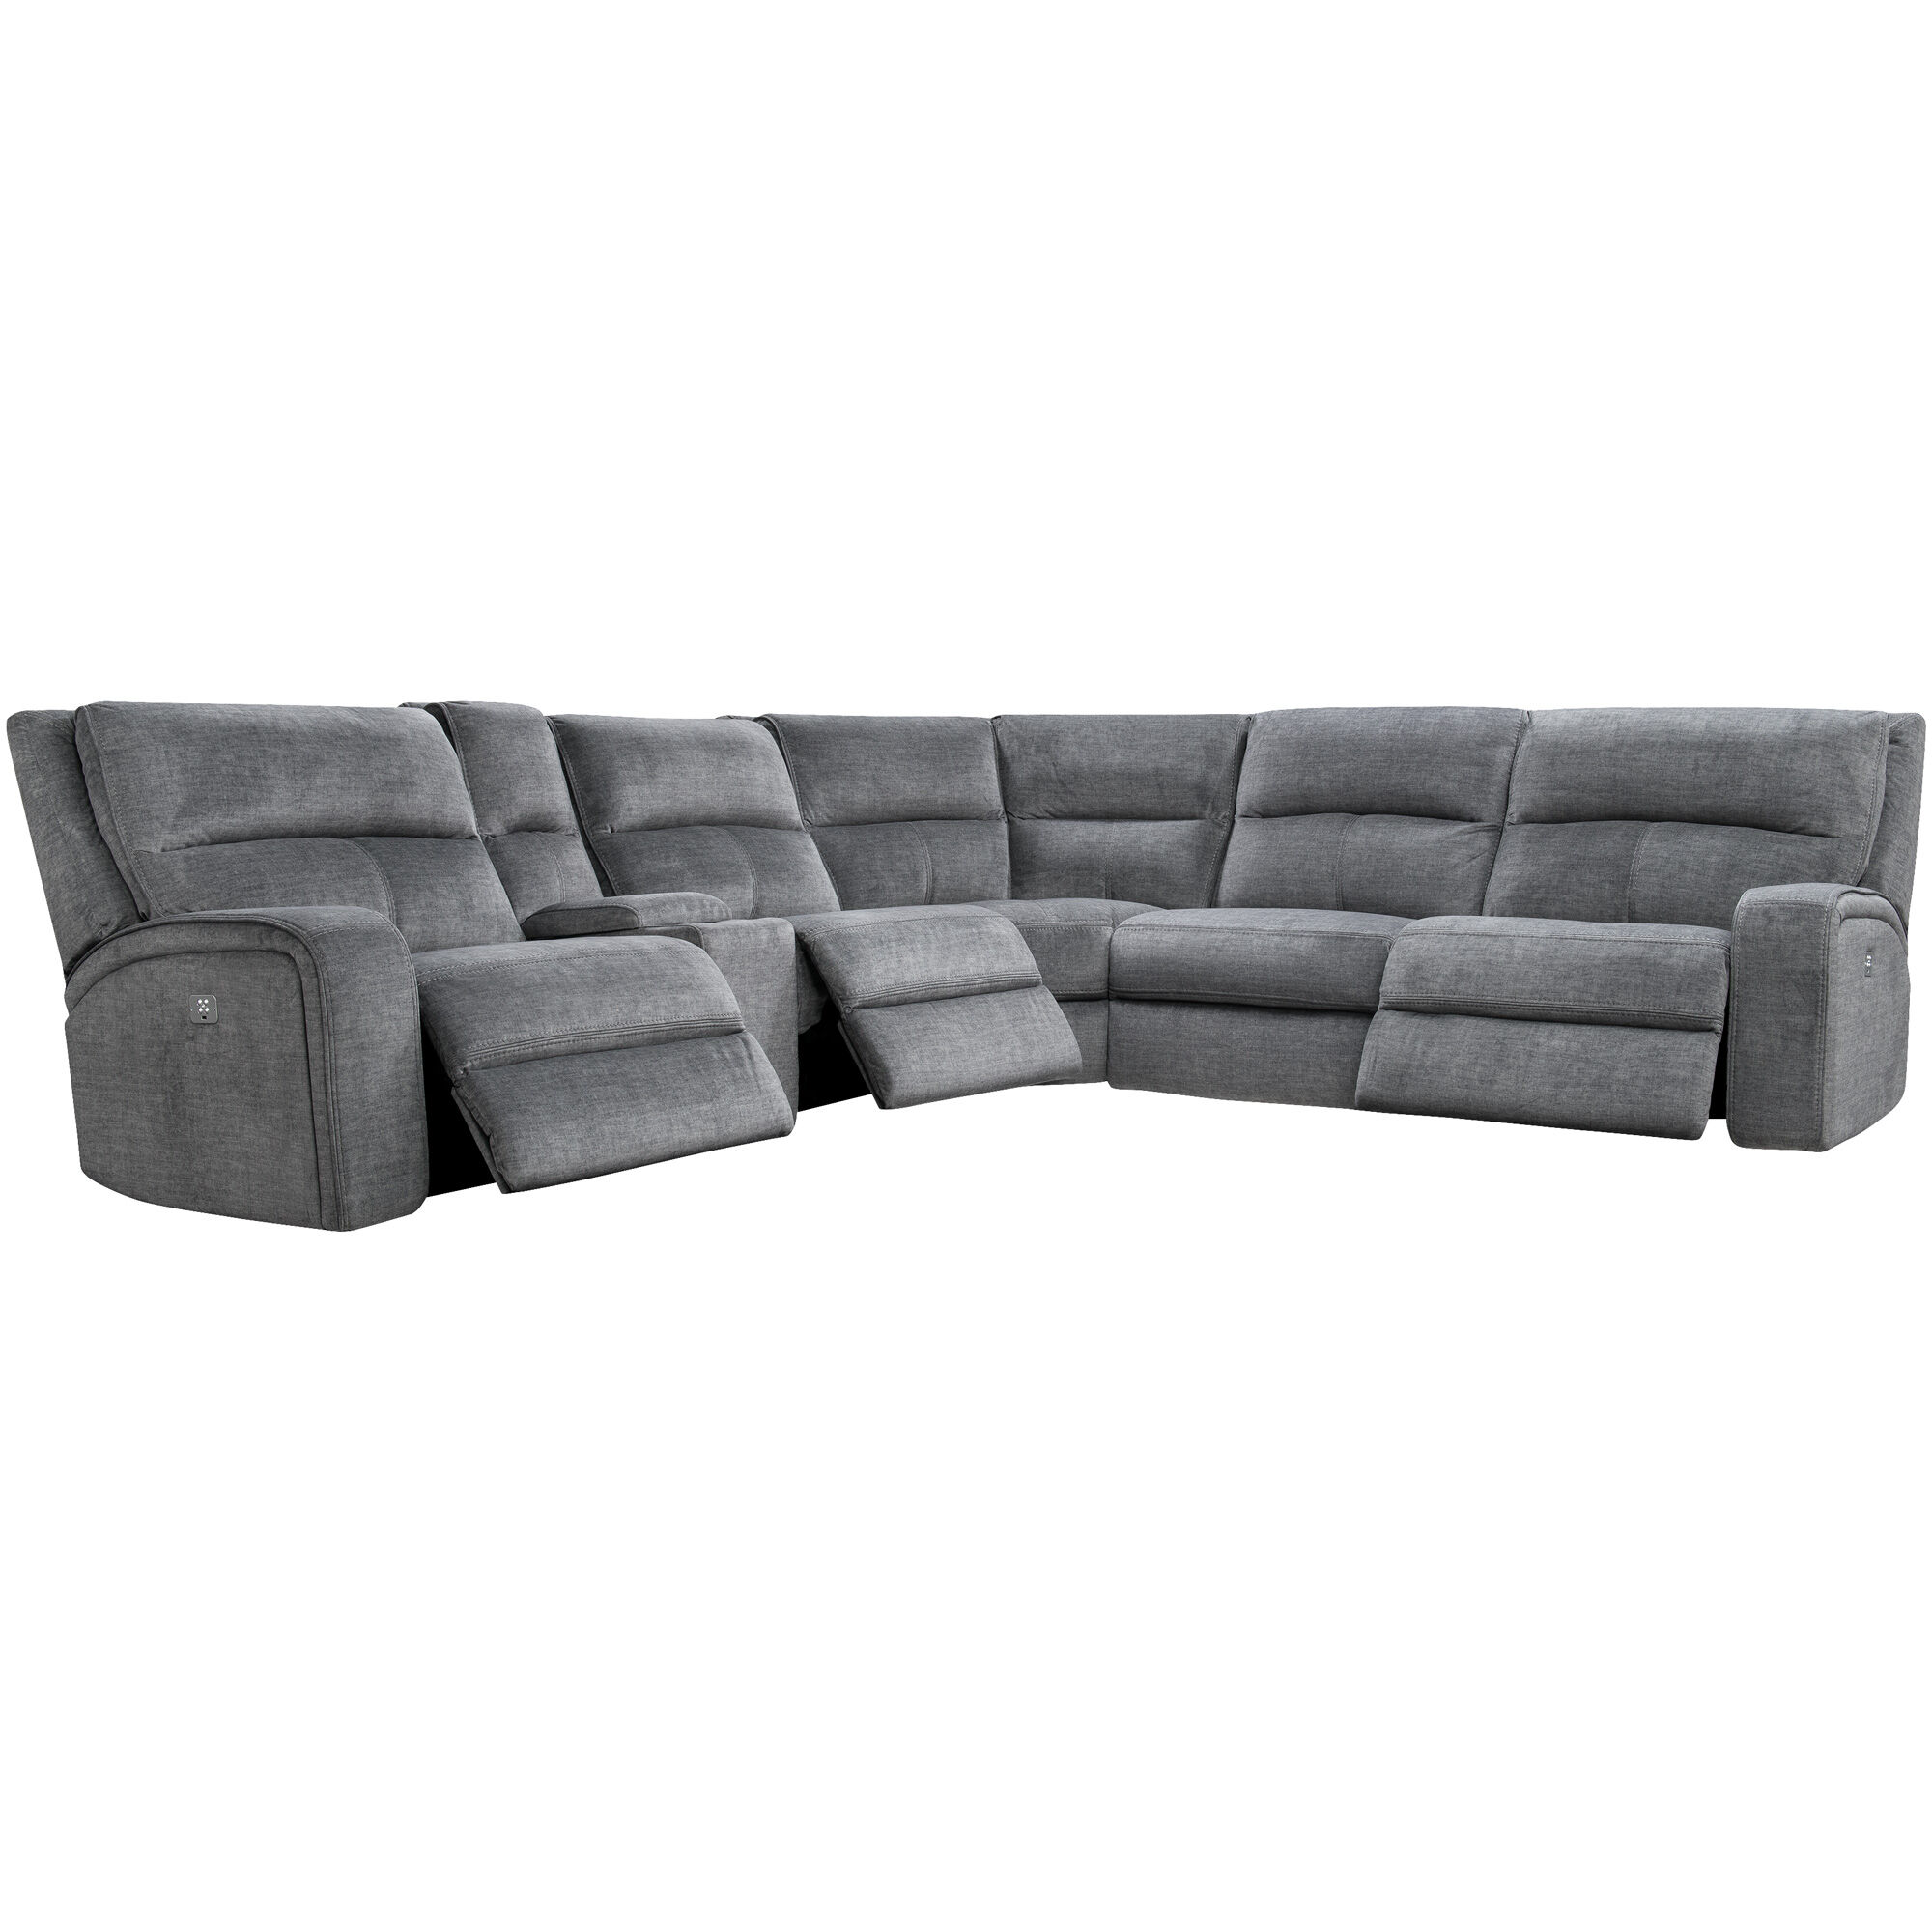 slumberland com sofas antique sofa style identification furniture cordova room group